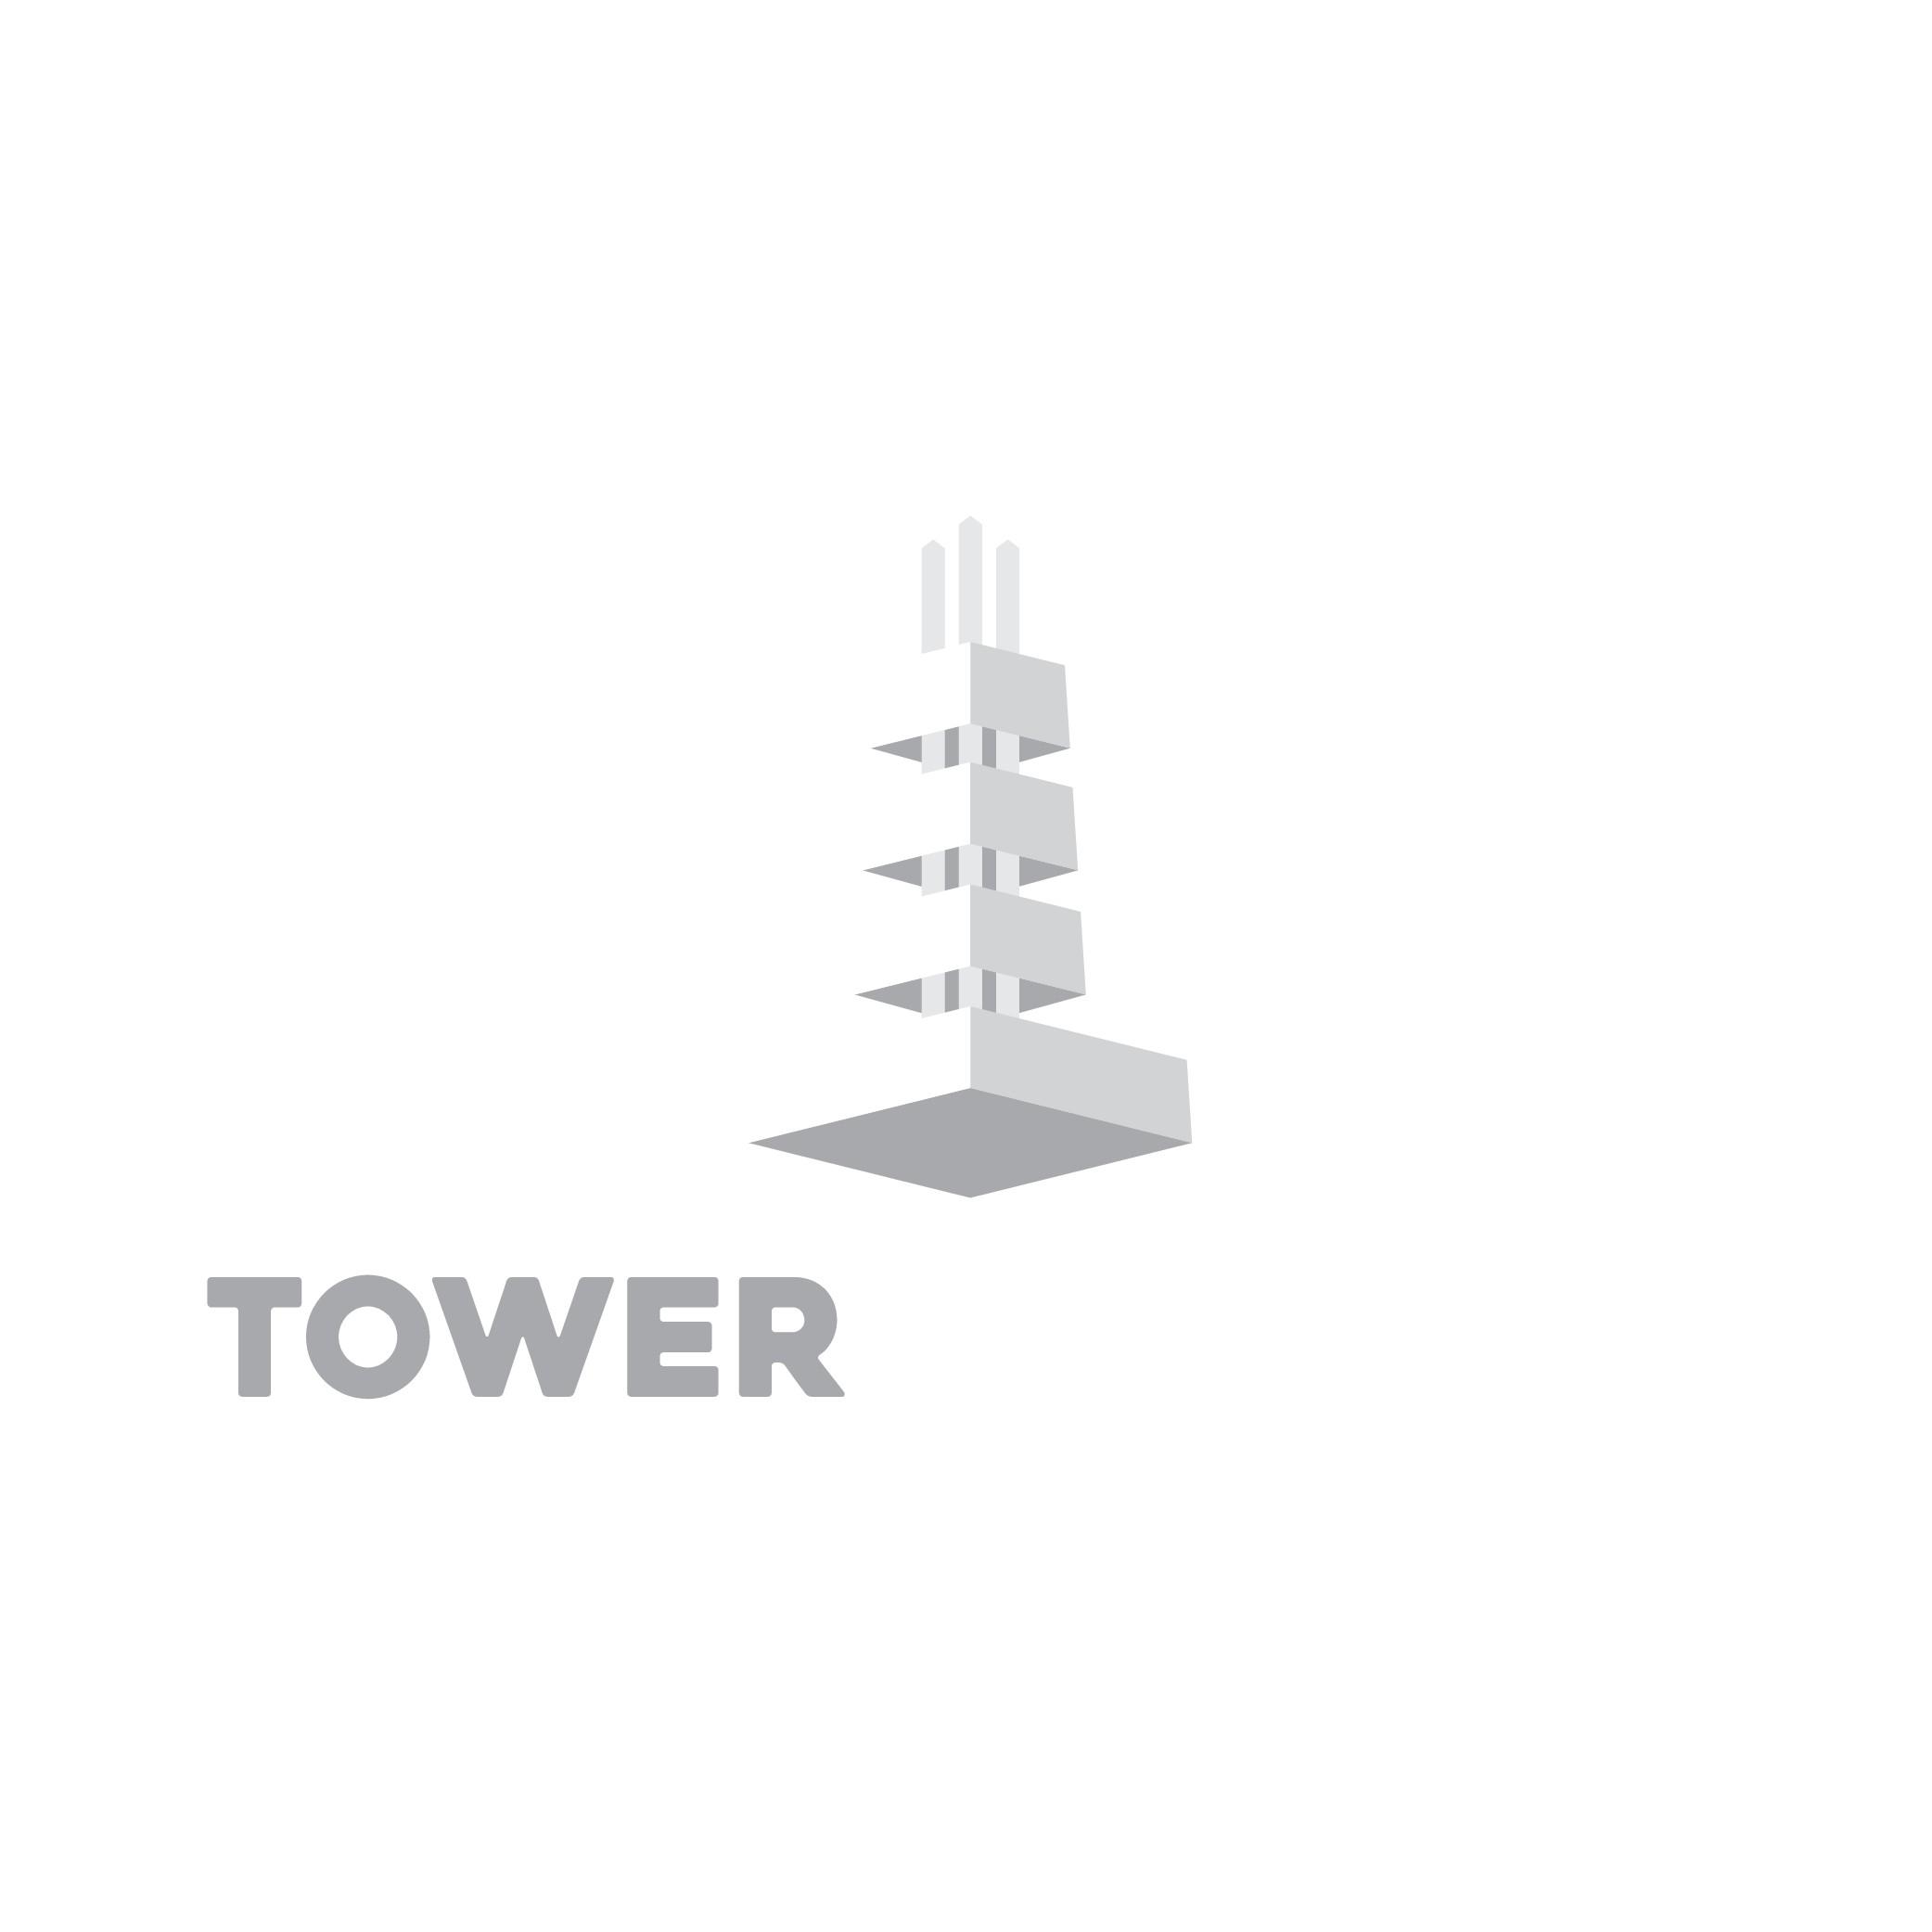 Tower Robotics - New Logo!